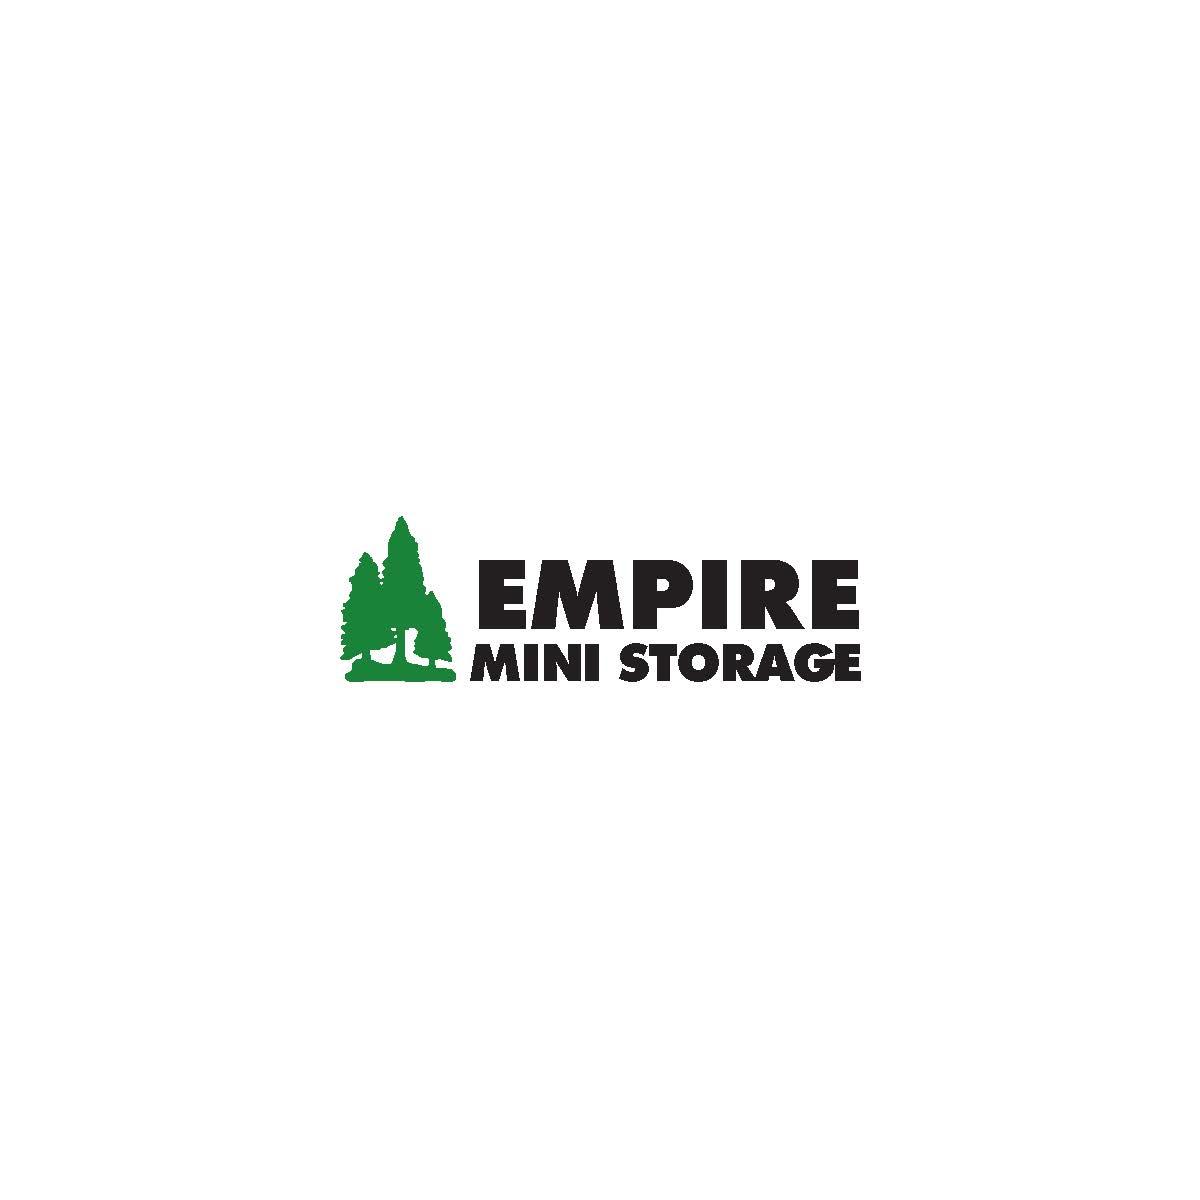 Empire Mini Storage logo.jpg